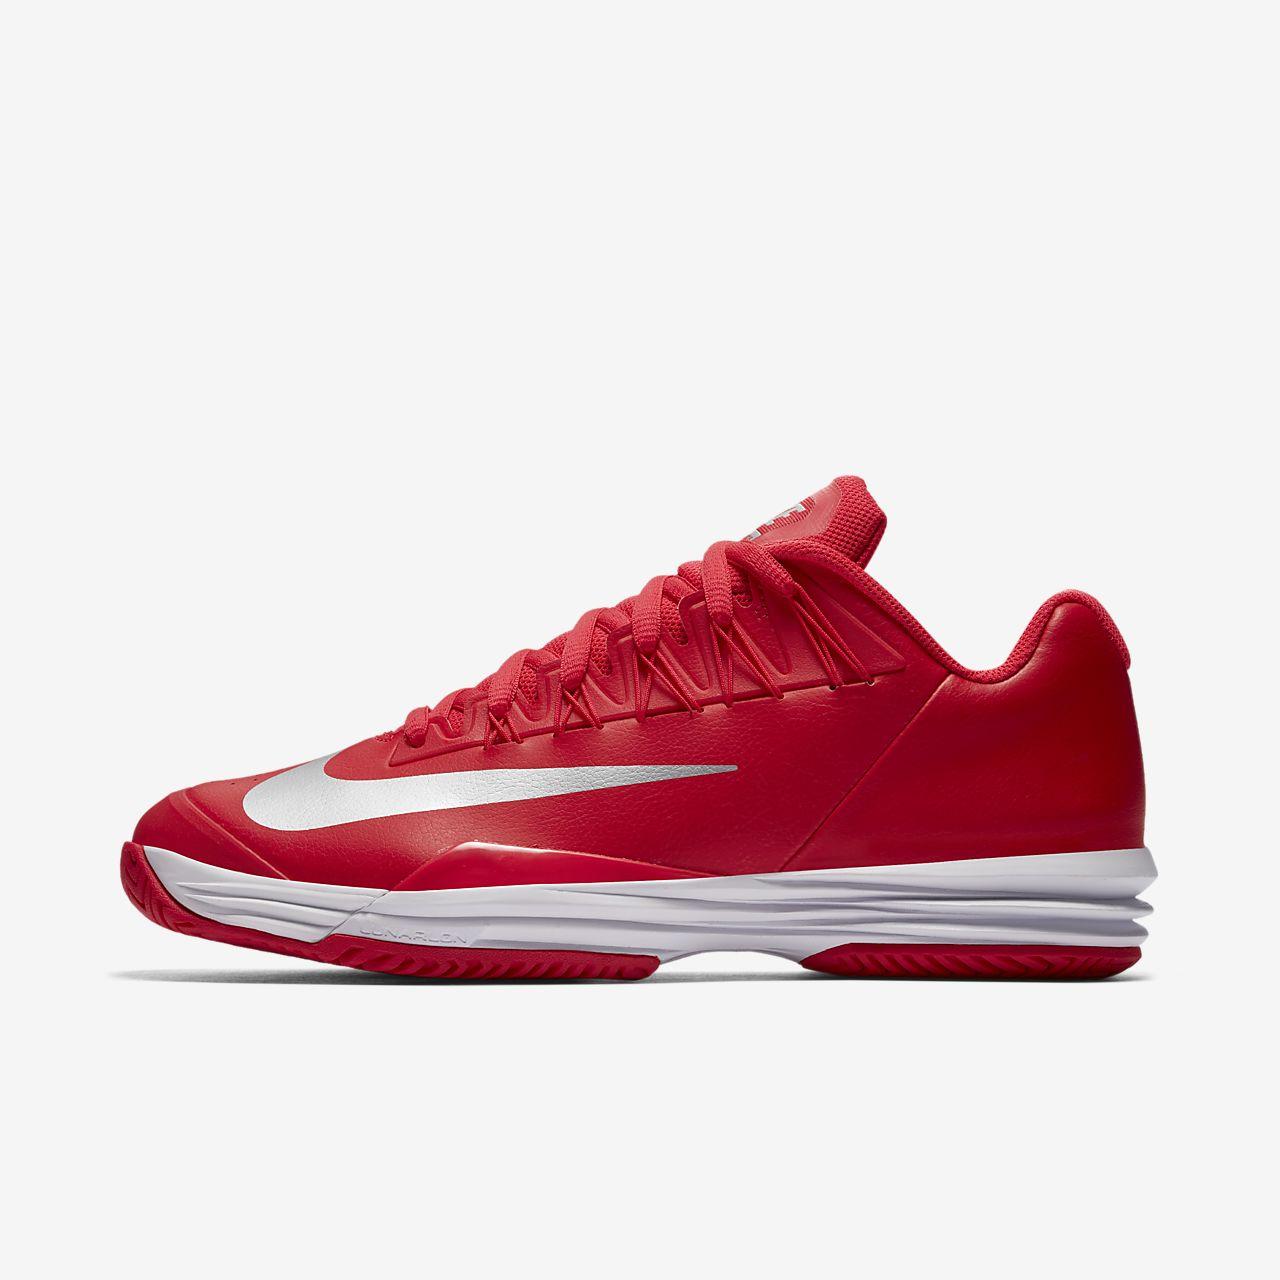 40c22640f4b1 NikeCourt Lunar Ballistec 1.5 Mens Tennis Shoe ...